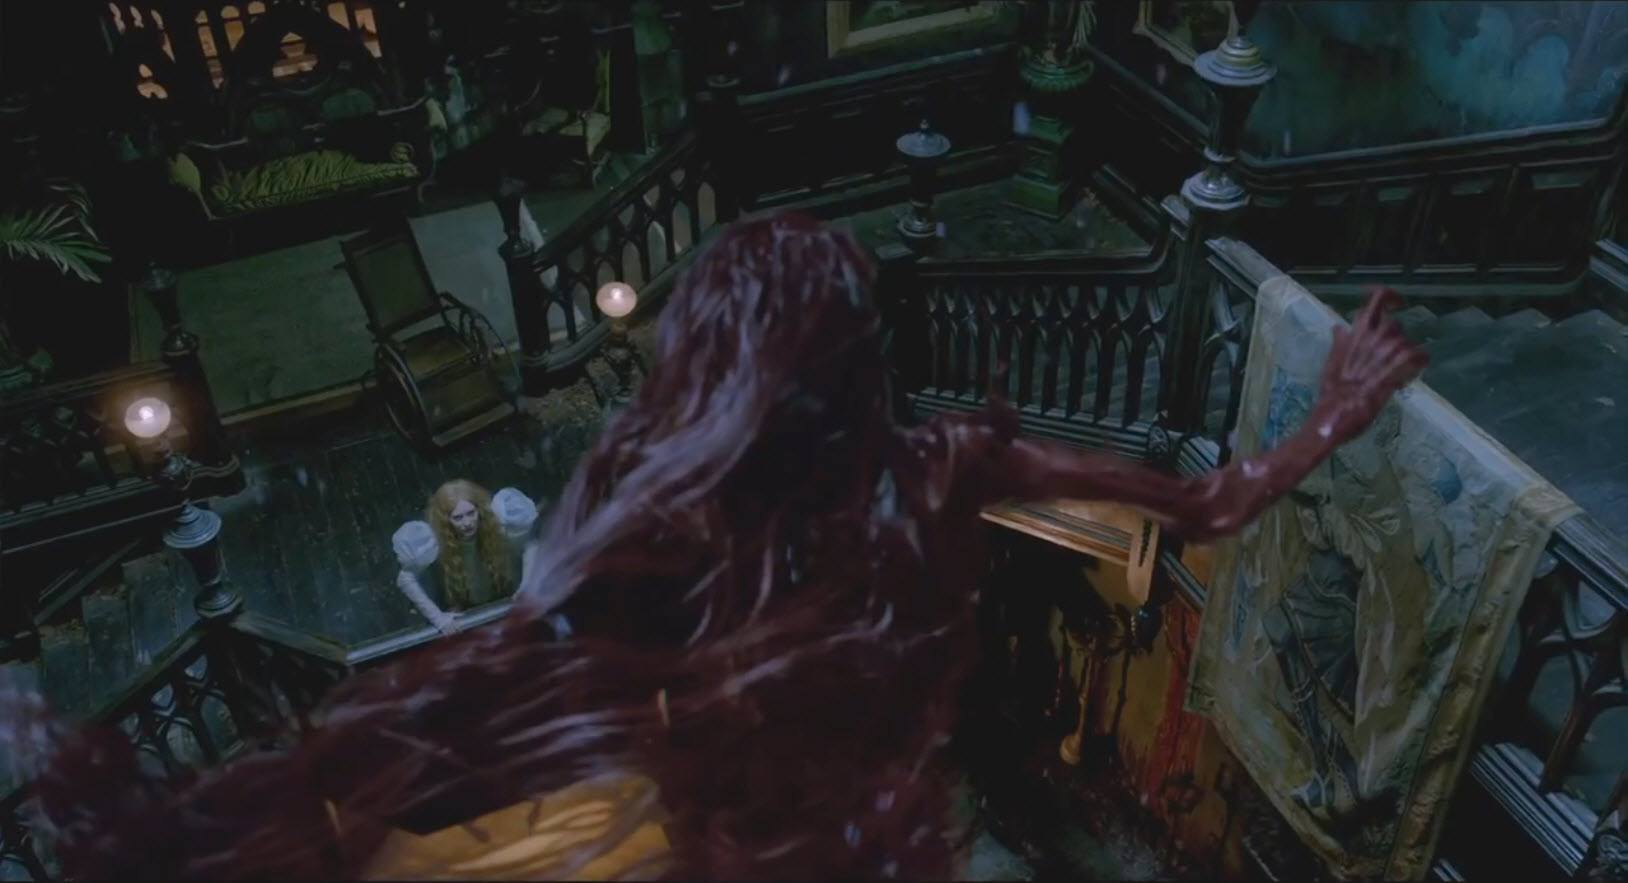 New Crimson Peak Images Show Tom Hiddleston Has Something